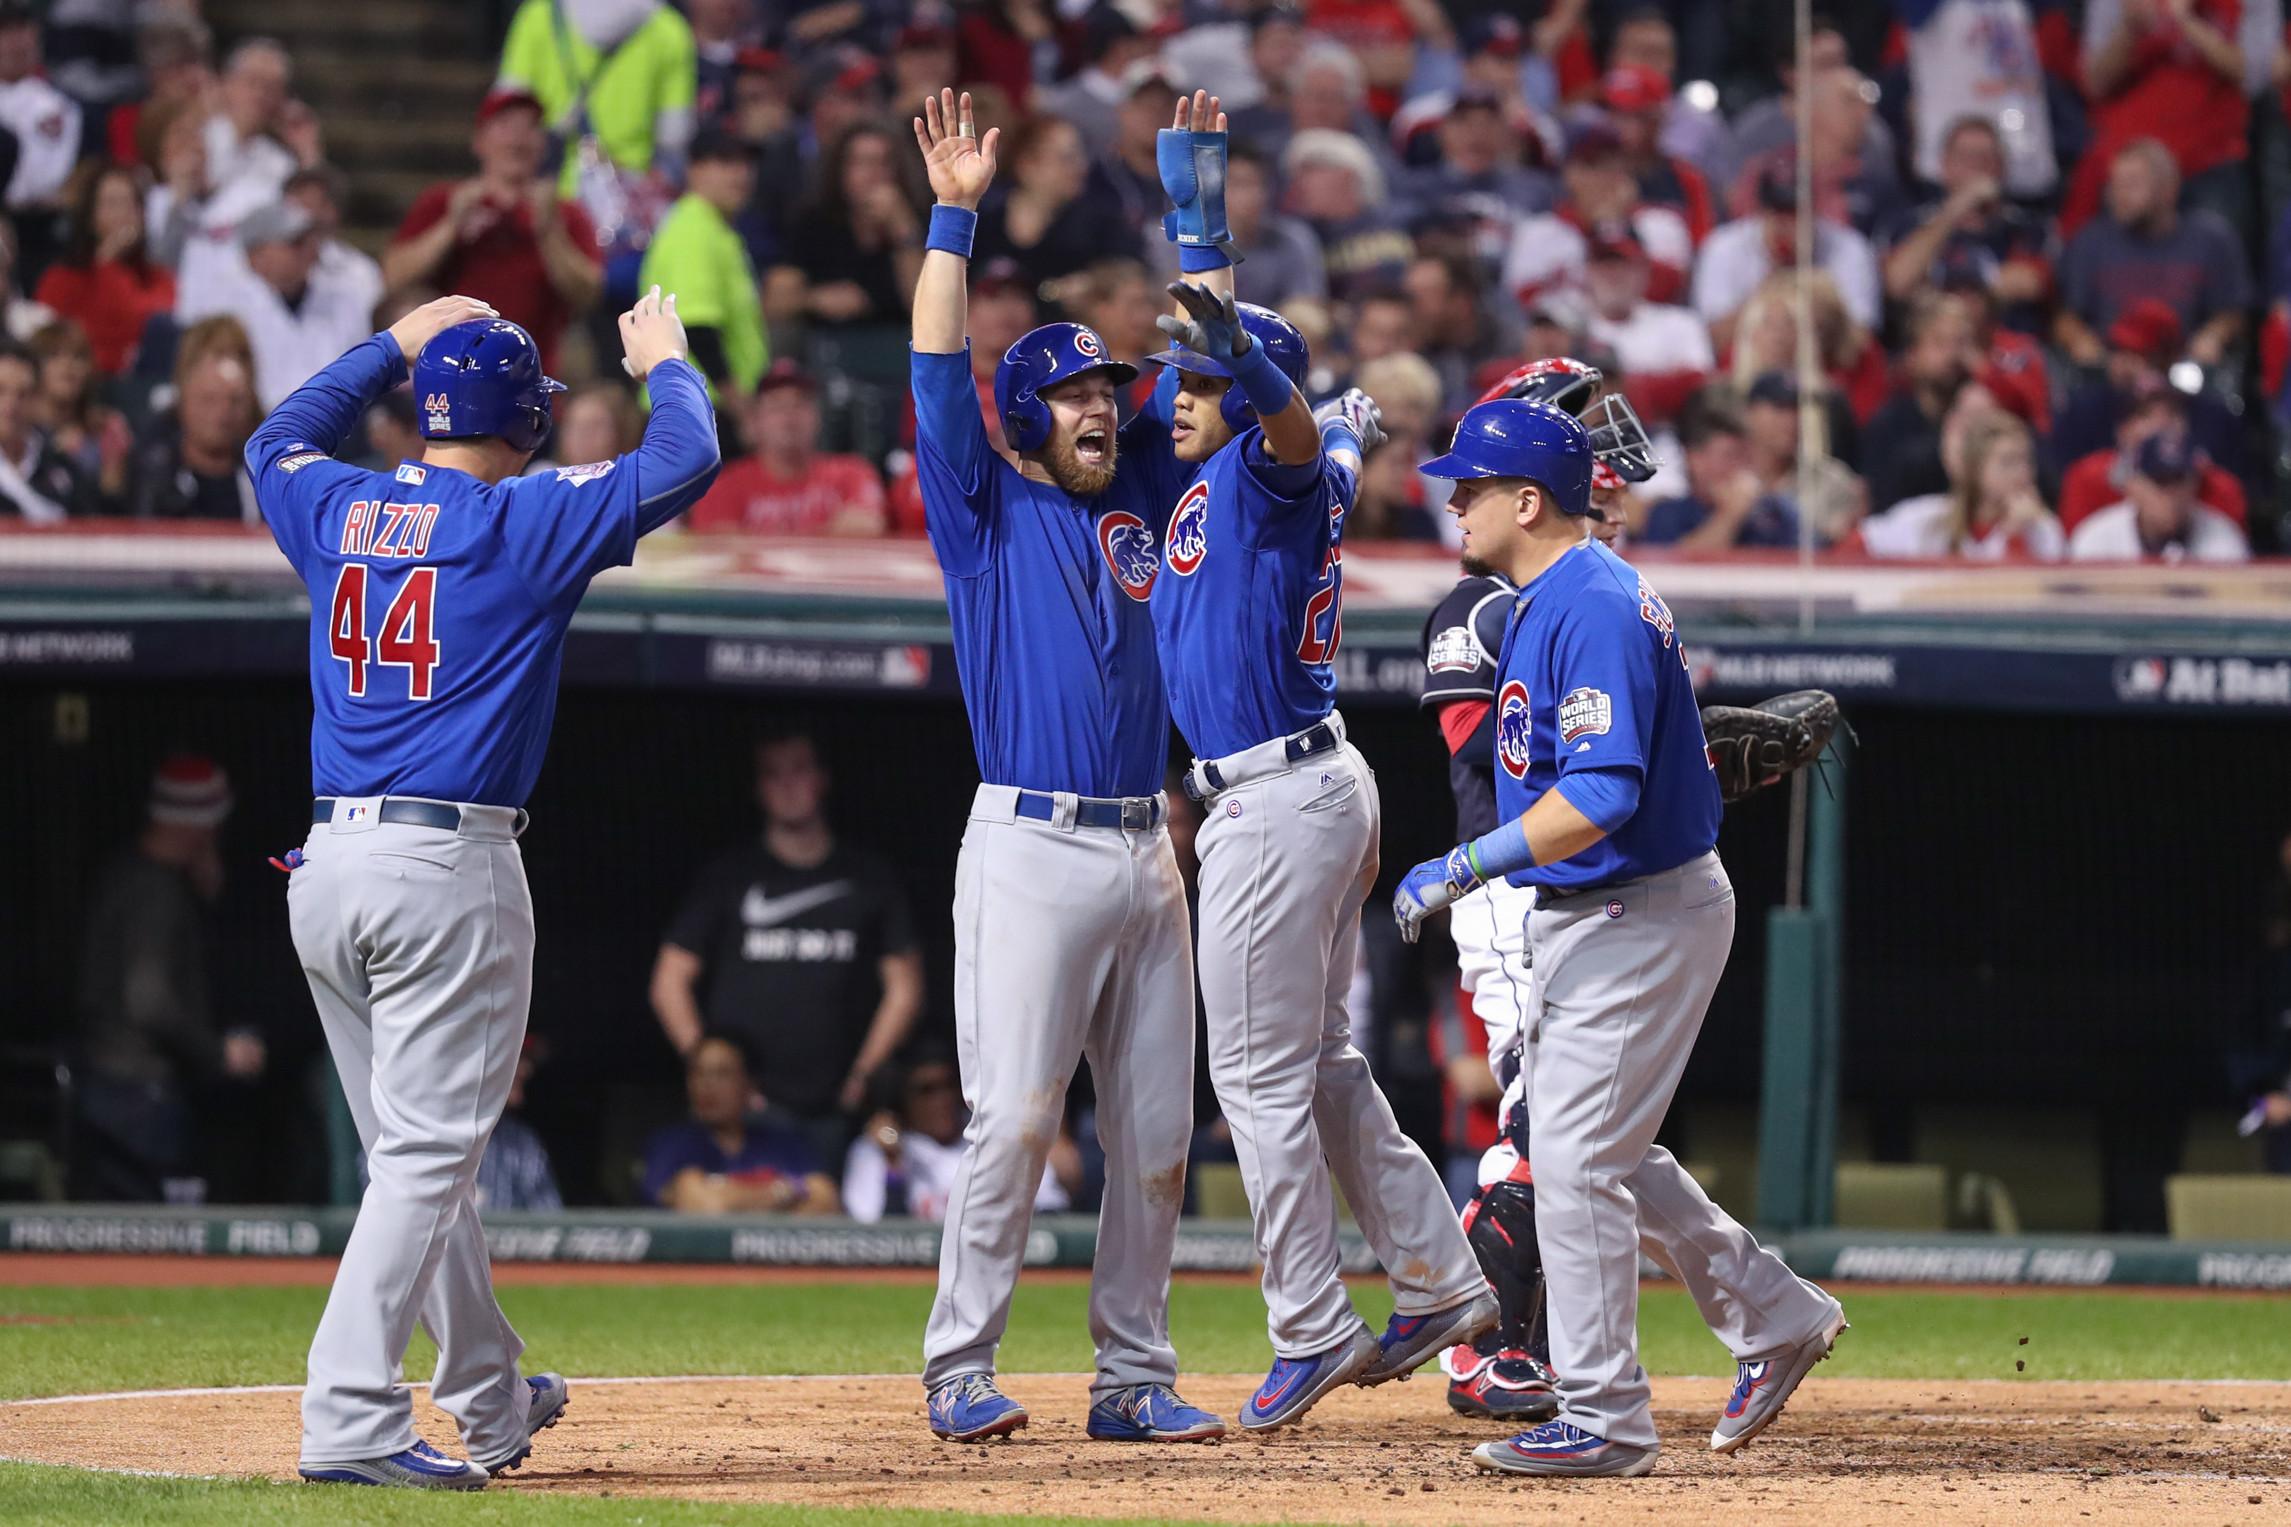 MLB: NOV 01 World Series – Game 6 – Cubs at Indians